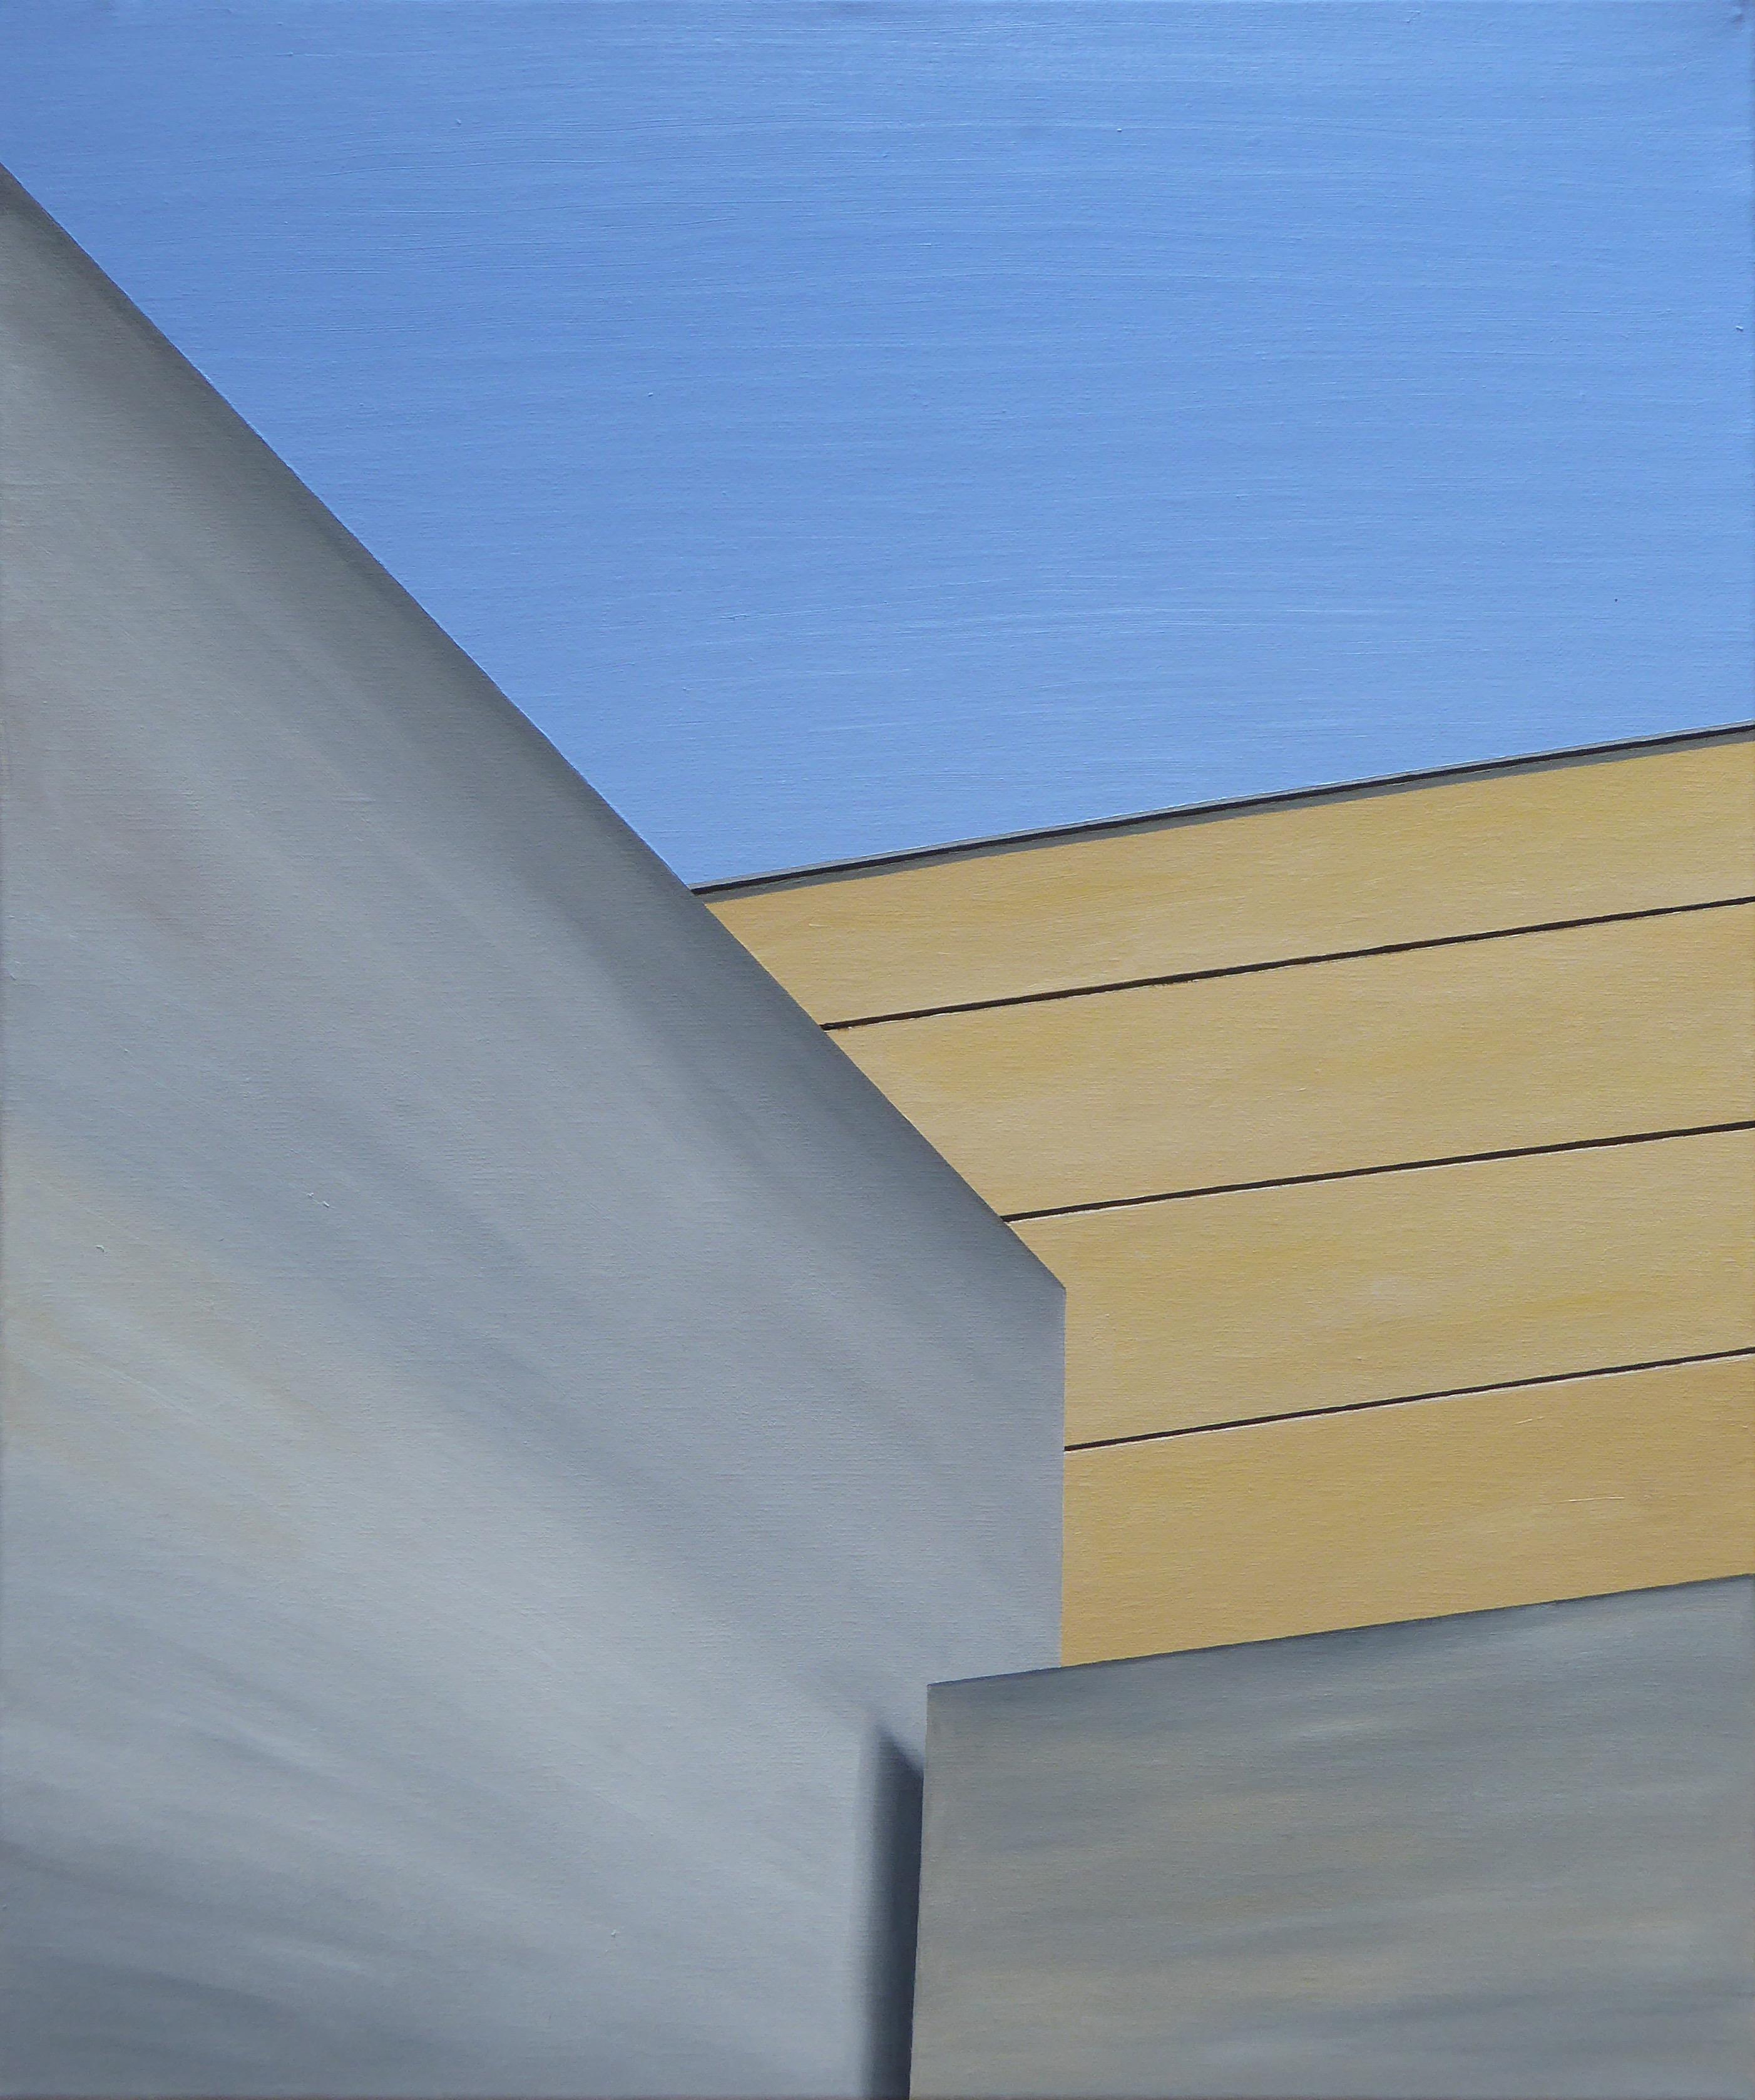 Les Eyzies VII, olja/duk, 50x61 cm